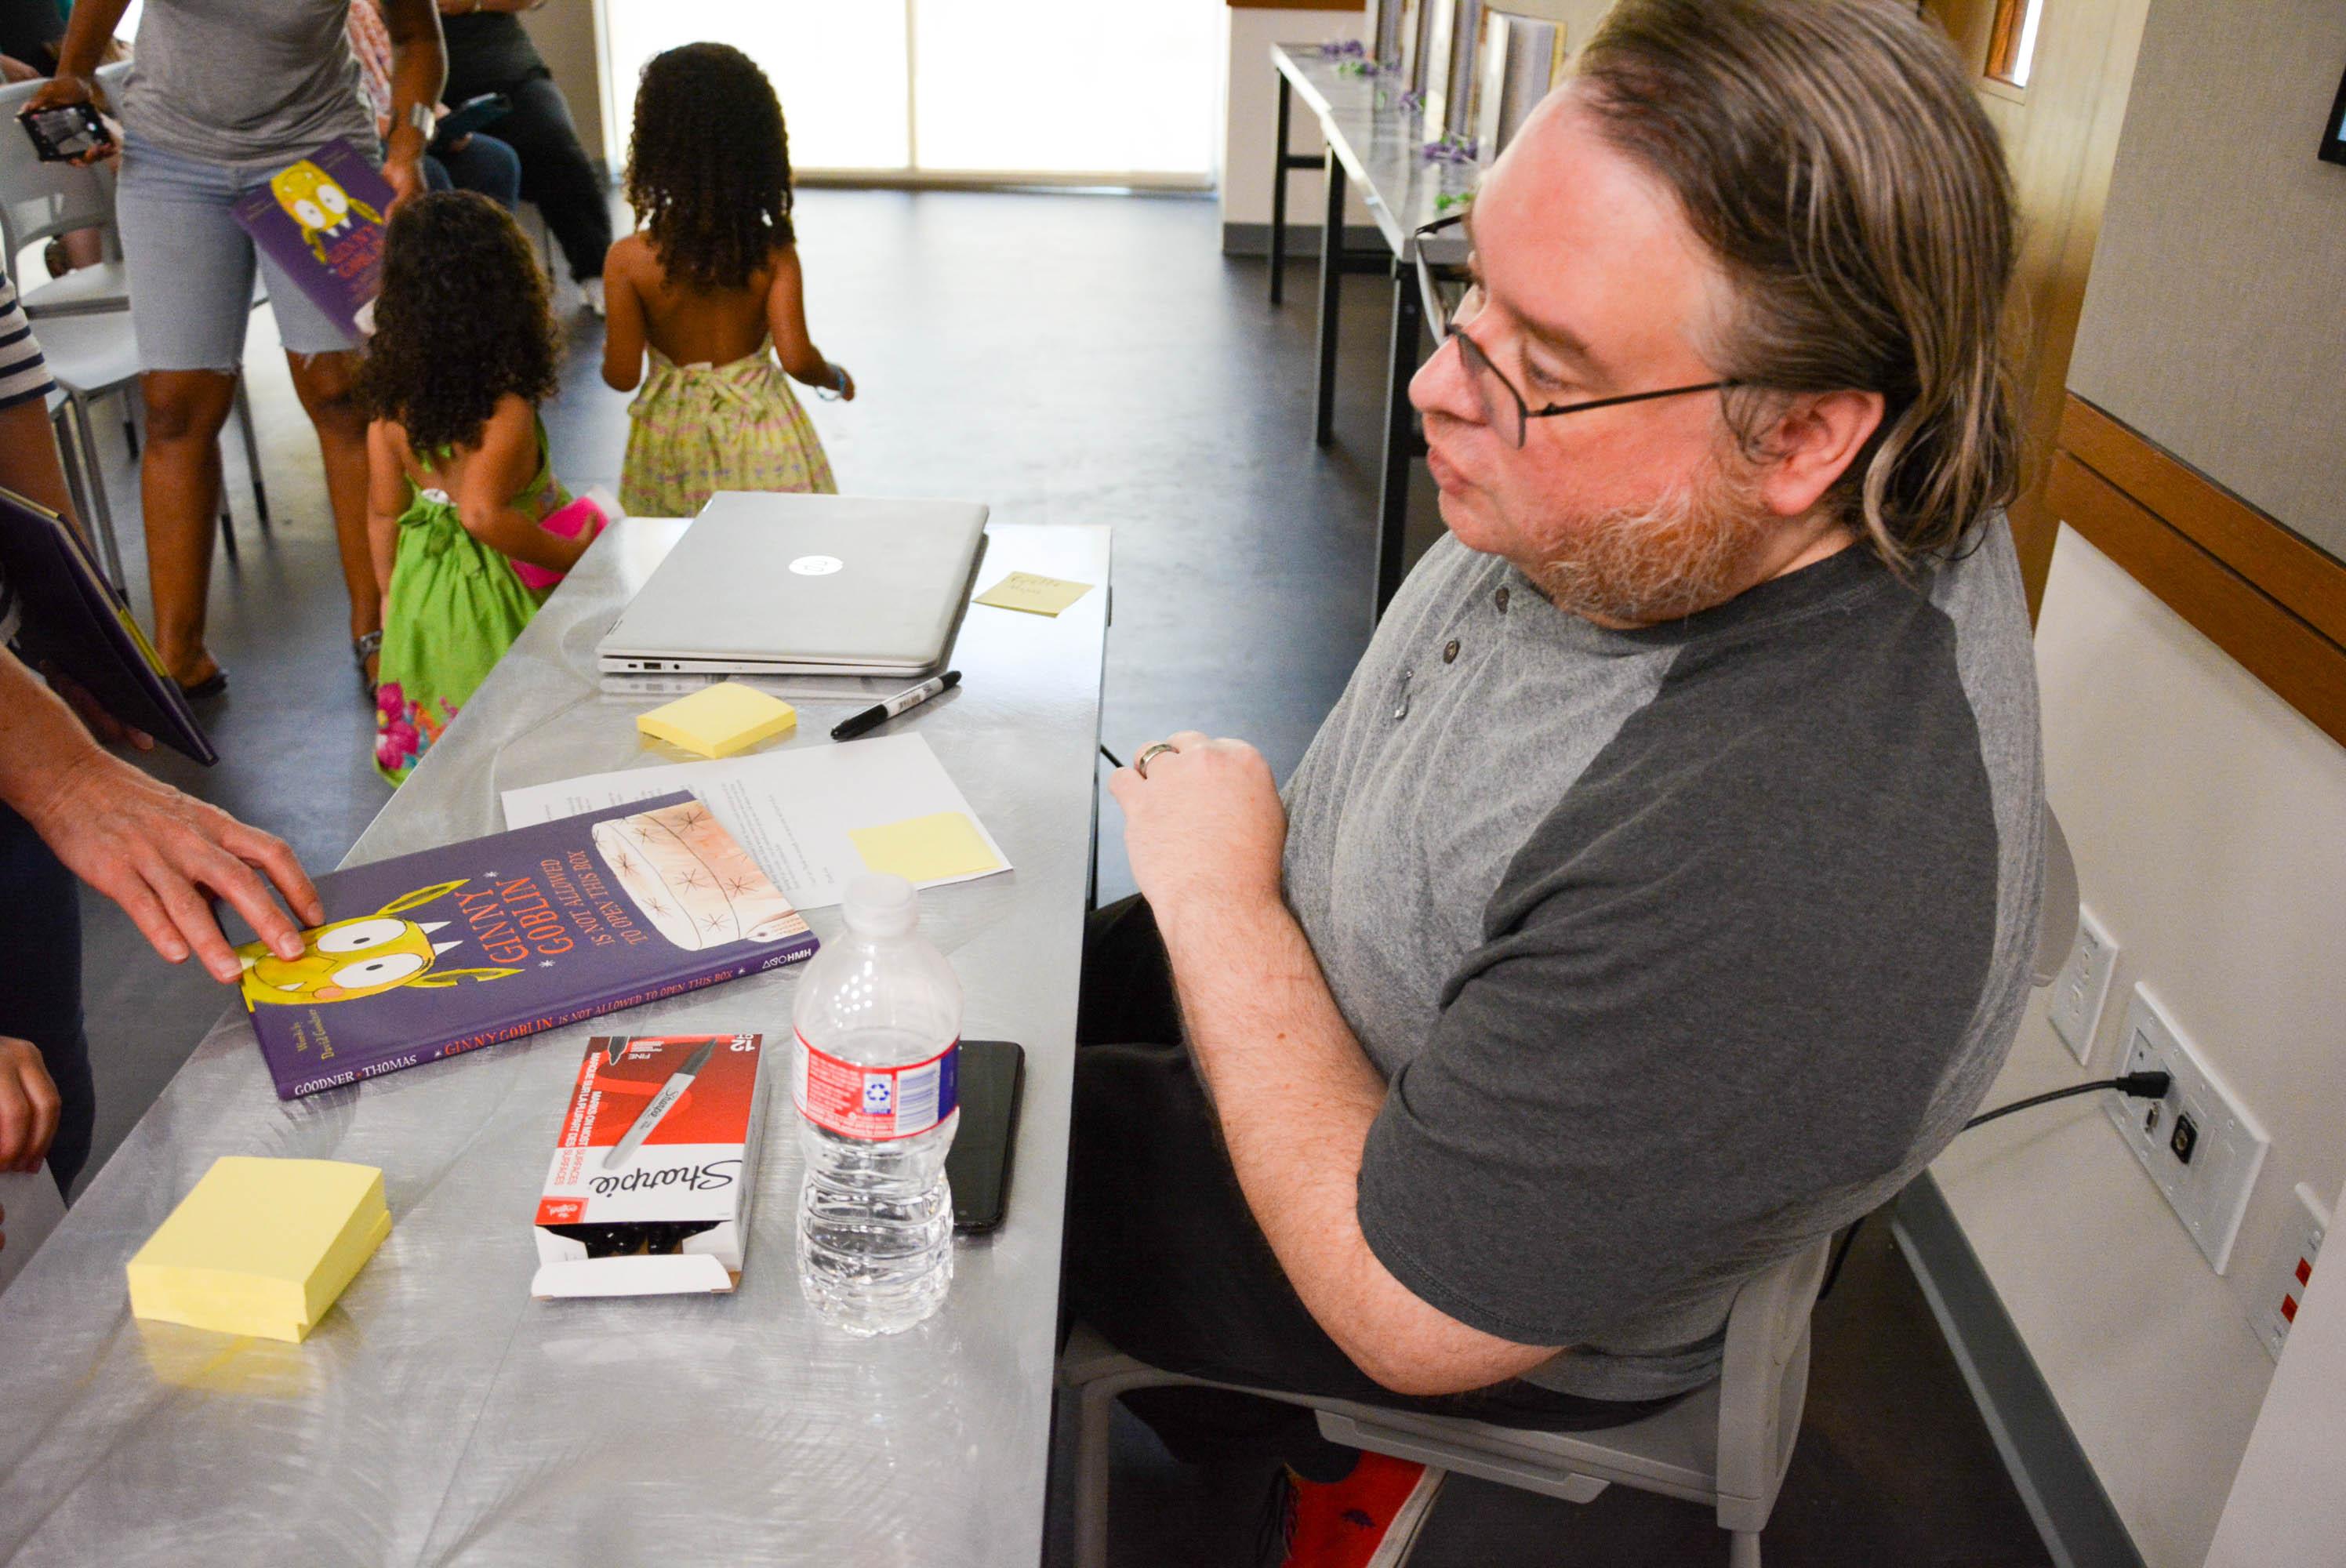 David Goodner signing books